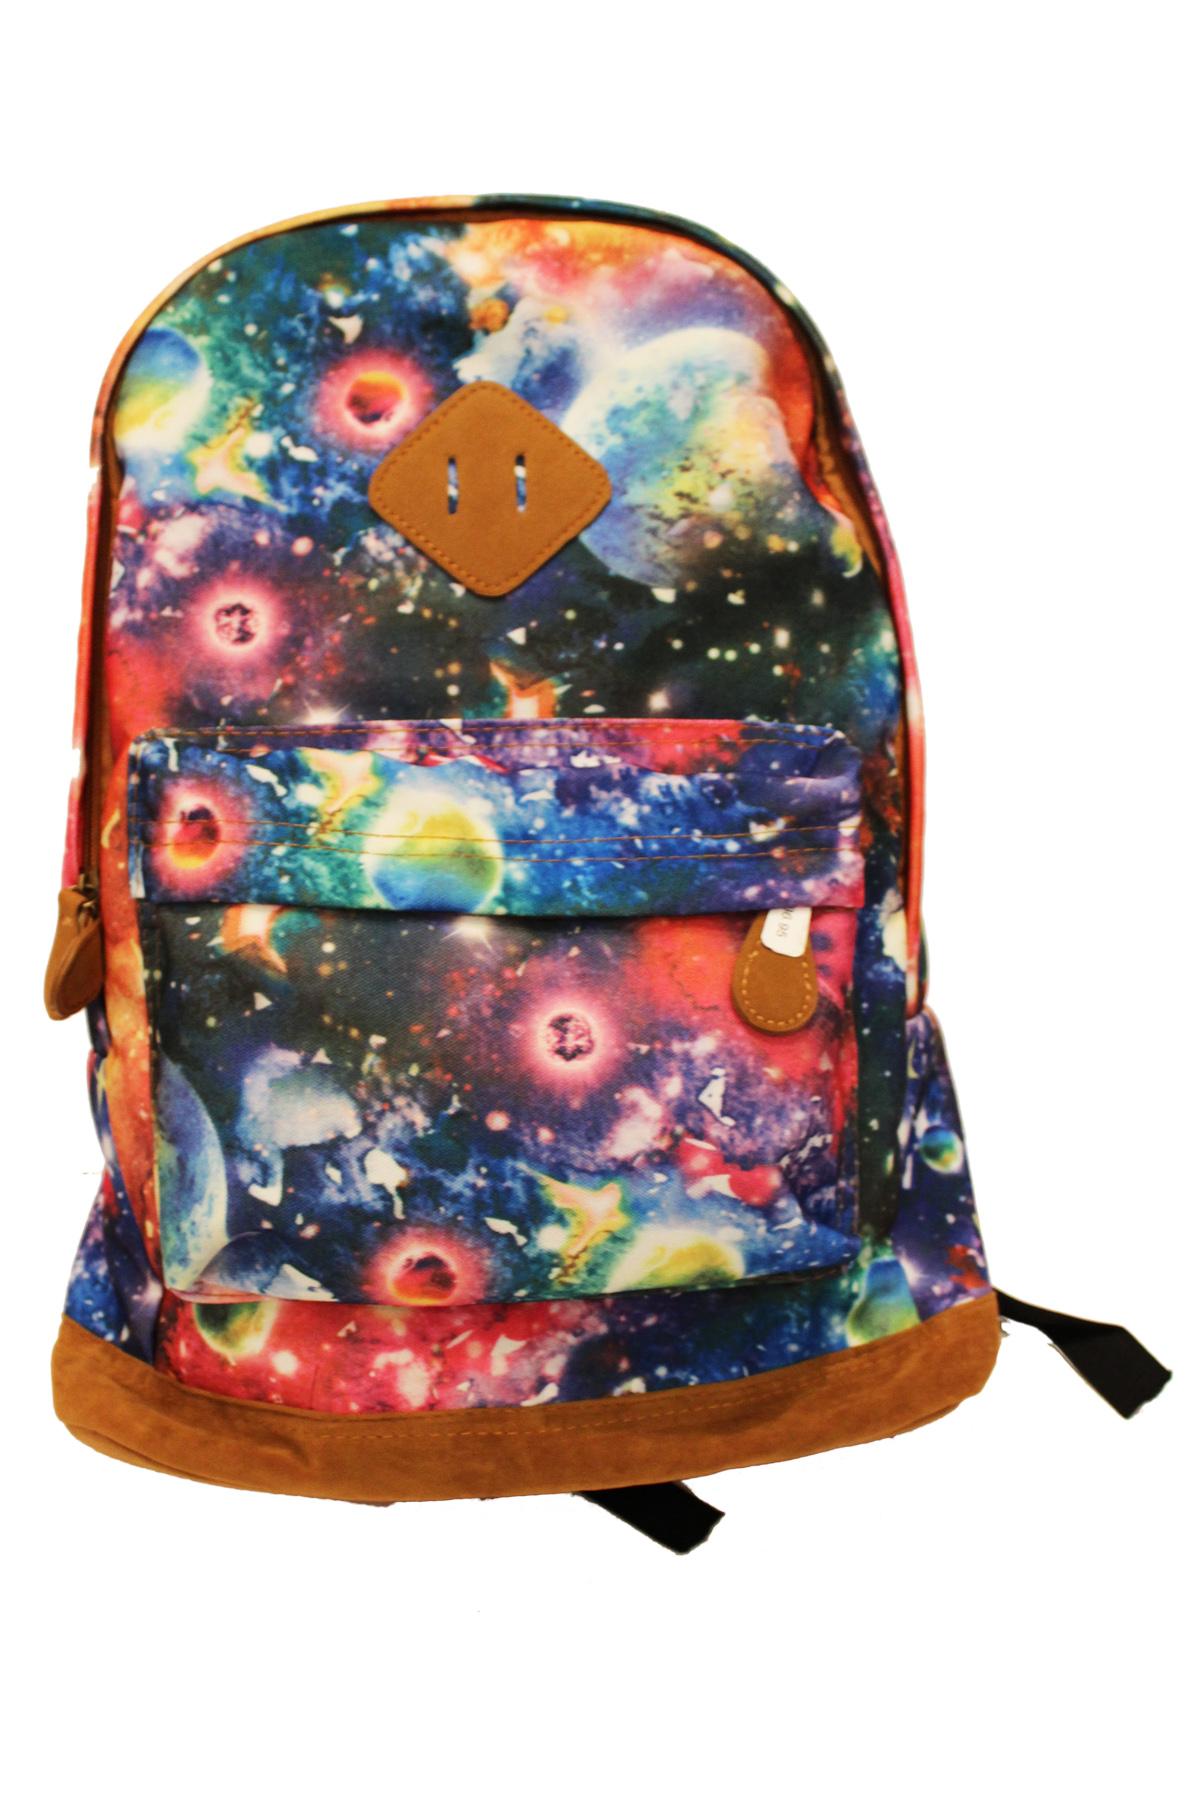 Infinity & beyond backpack